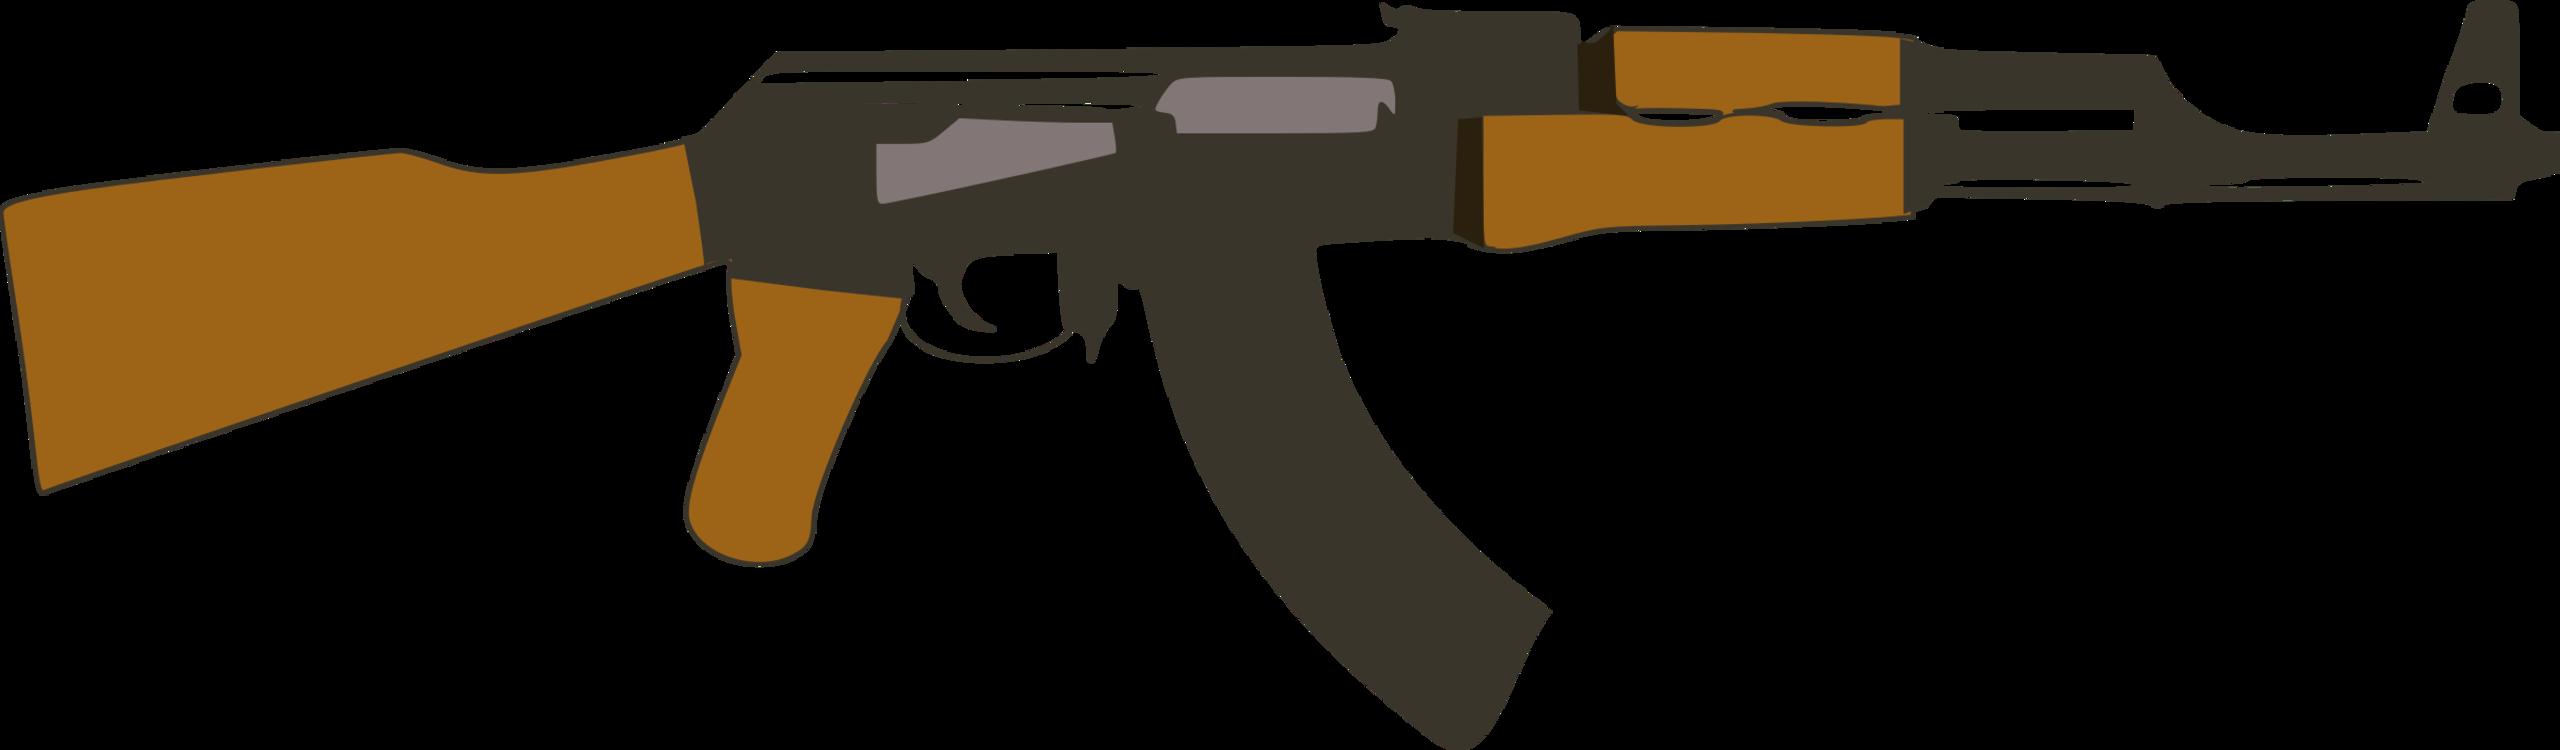 image black and white guns vector pdf #113369132